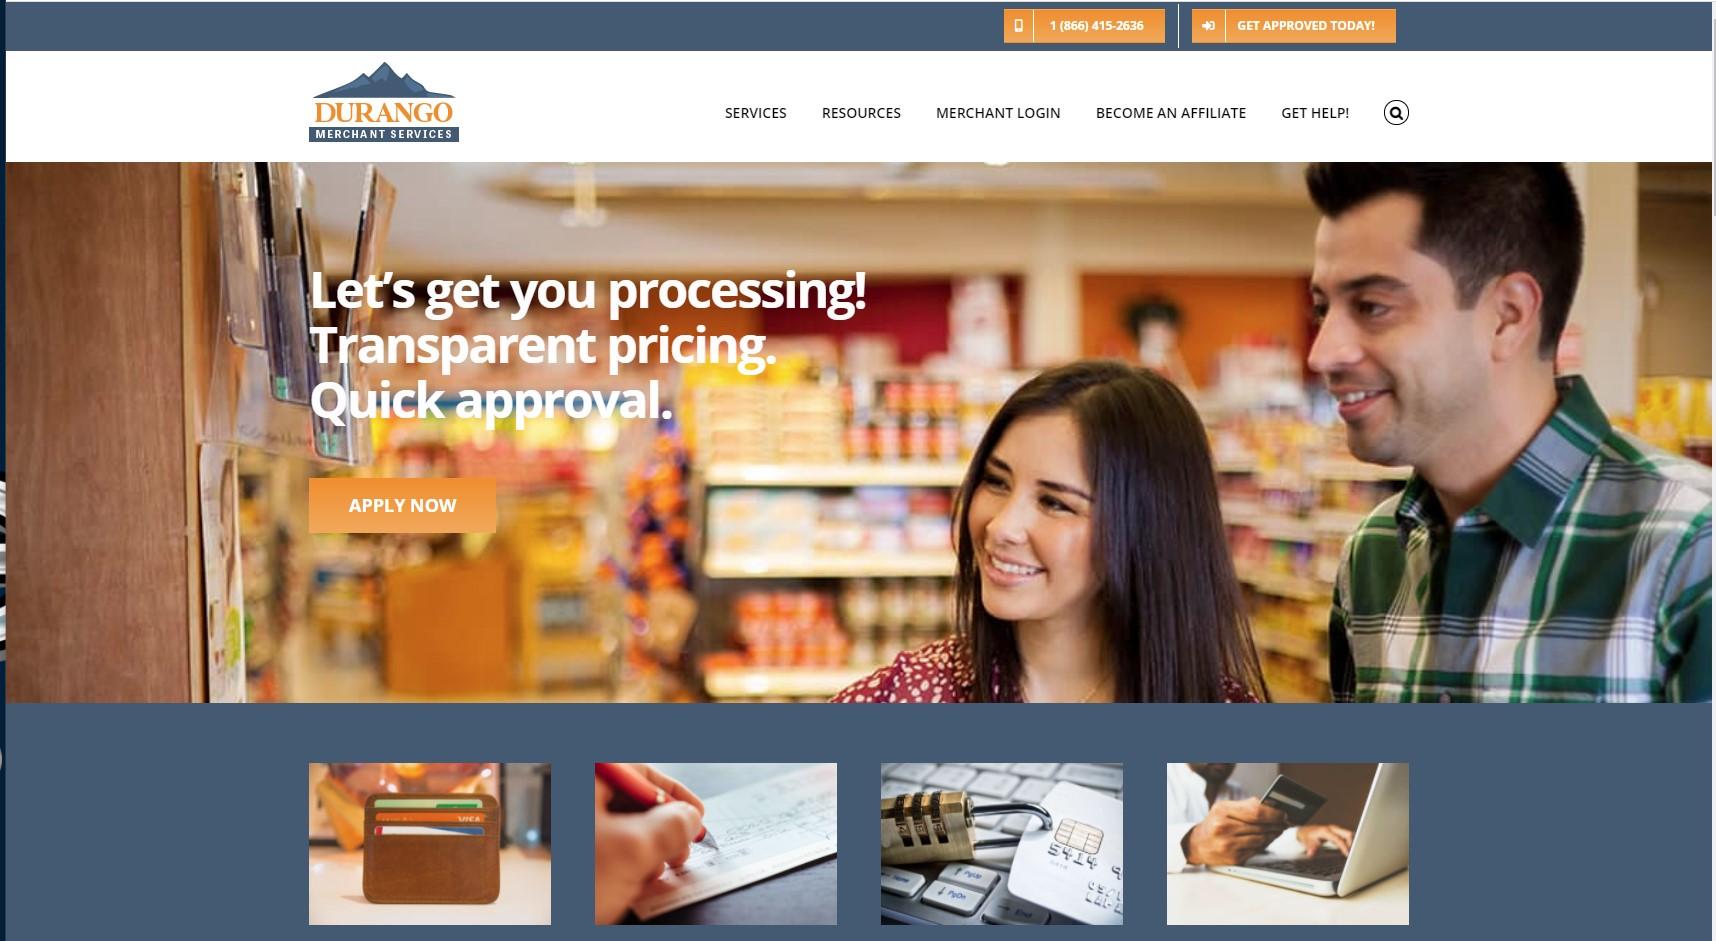 Durango Merchant Services- Payment Service Provider